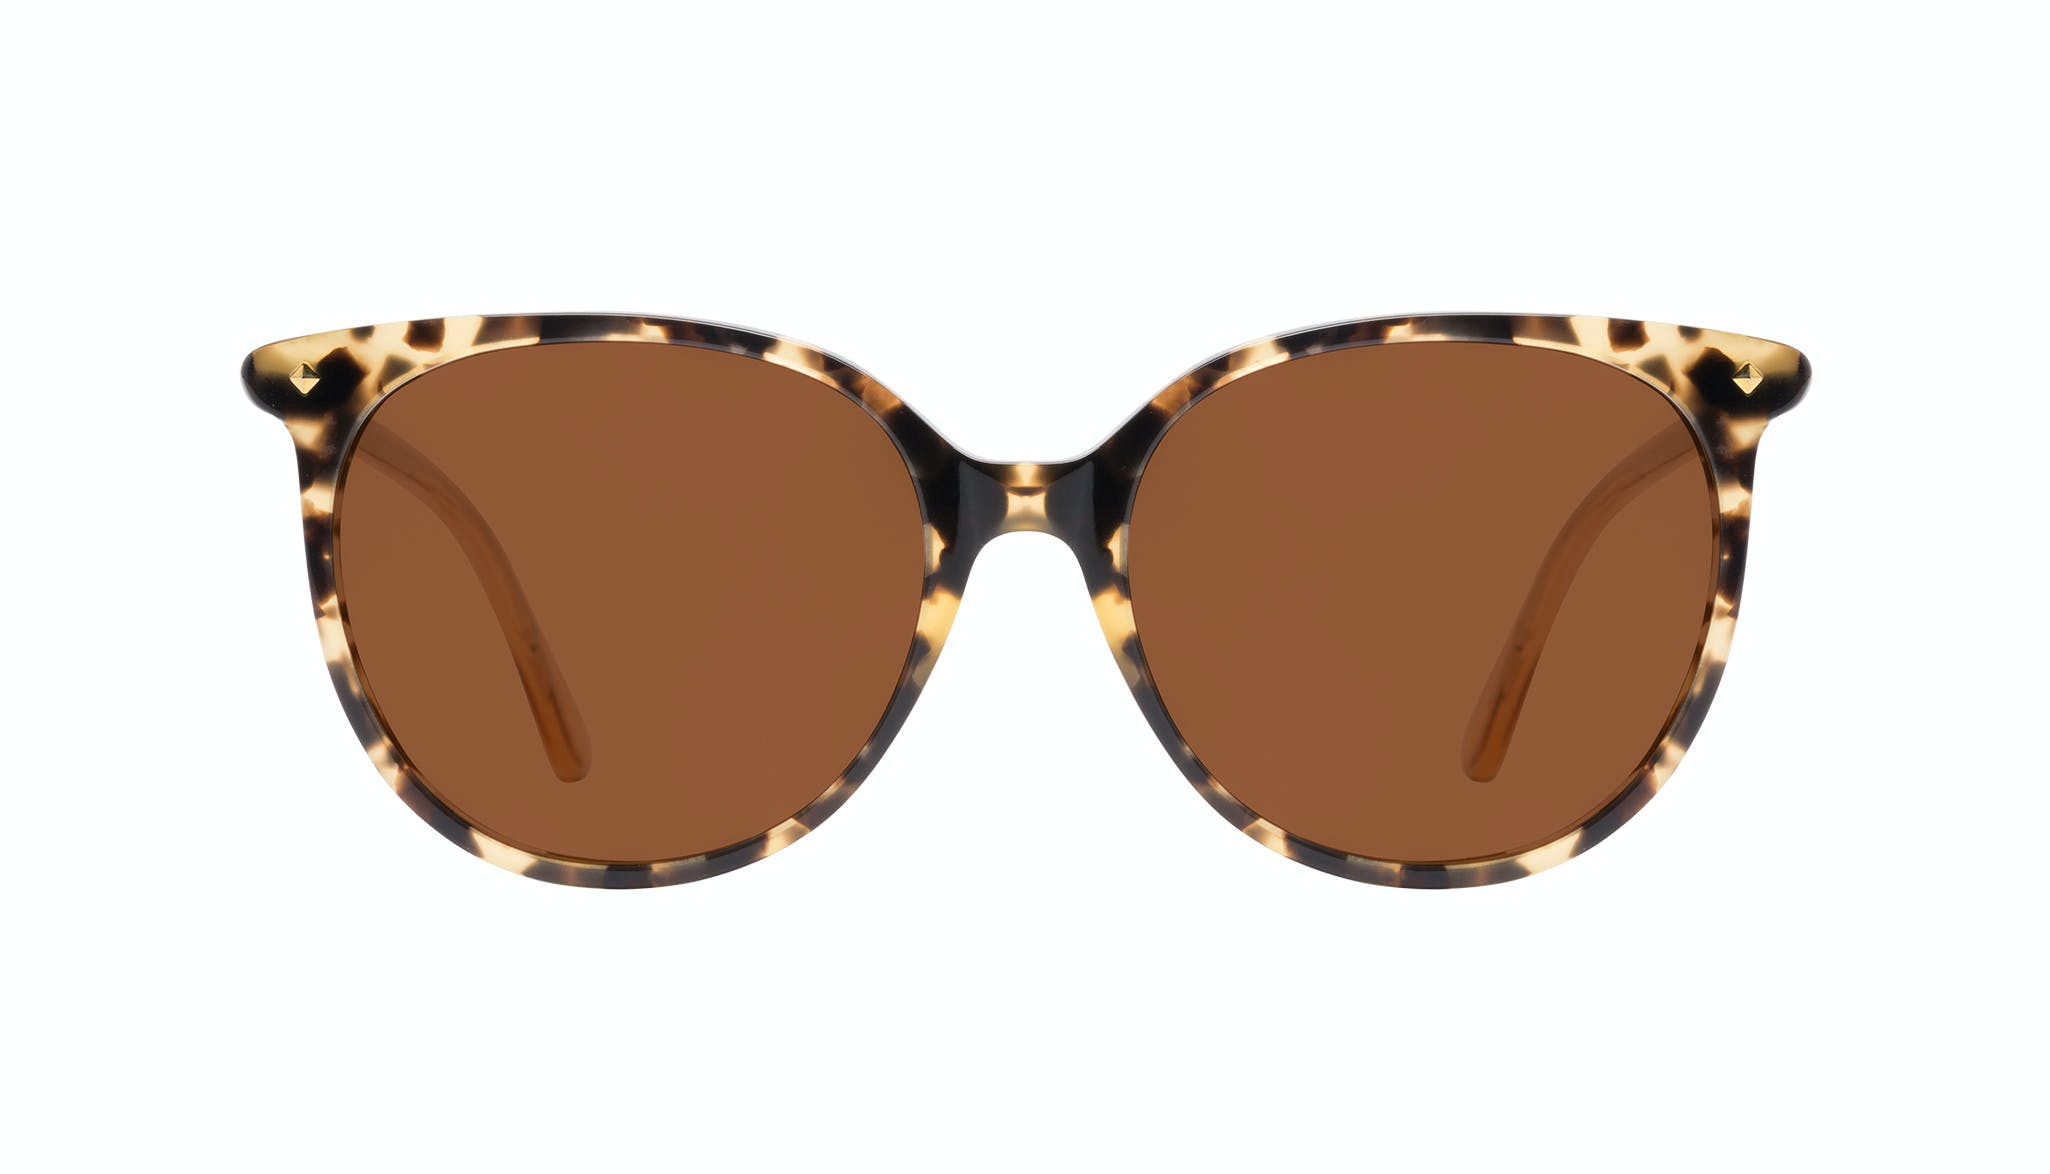 Affordable Fashion Glasses Cat Eye Sunglasses Women Area Petite Bingal